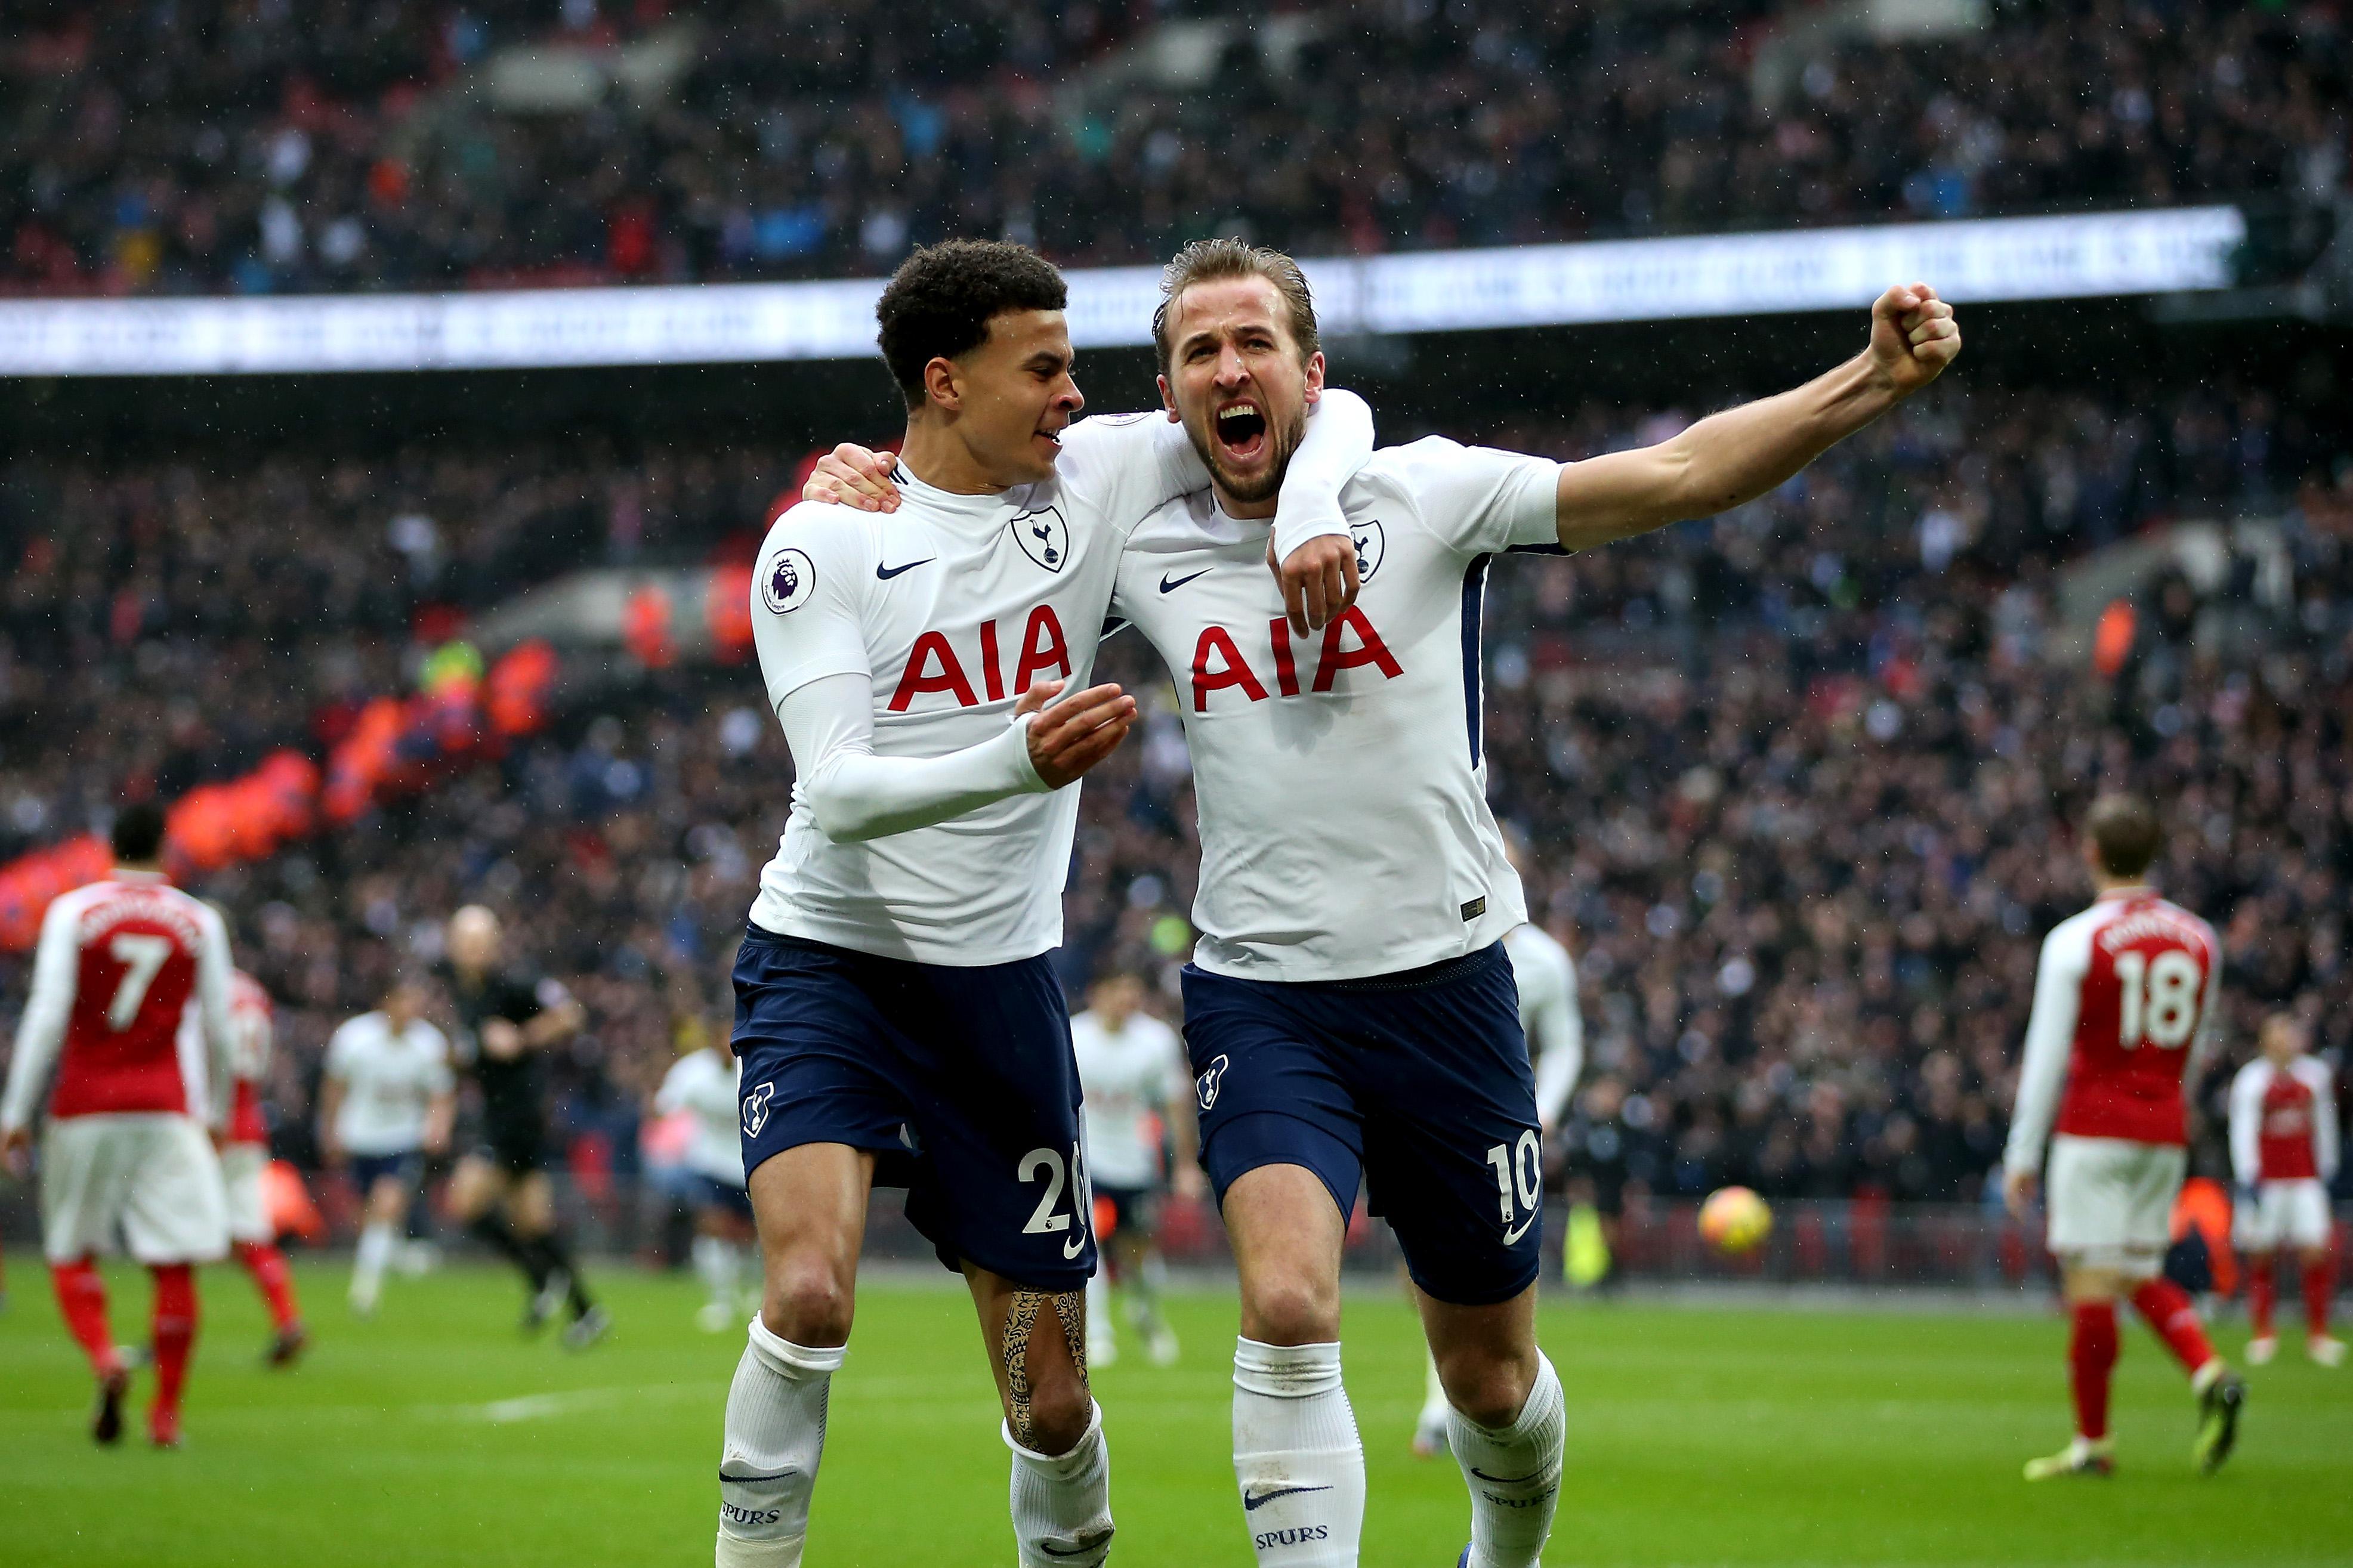 Tottenham Vs Leicester 2018: Kane Strikes Again As Spurs Claim Derby Spoils